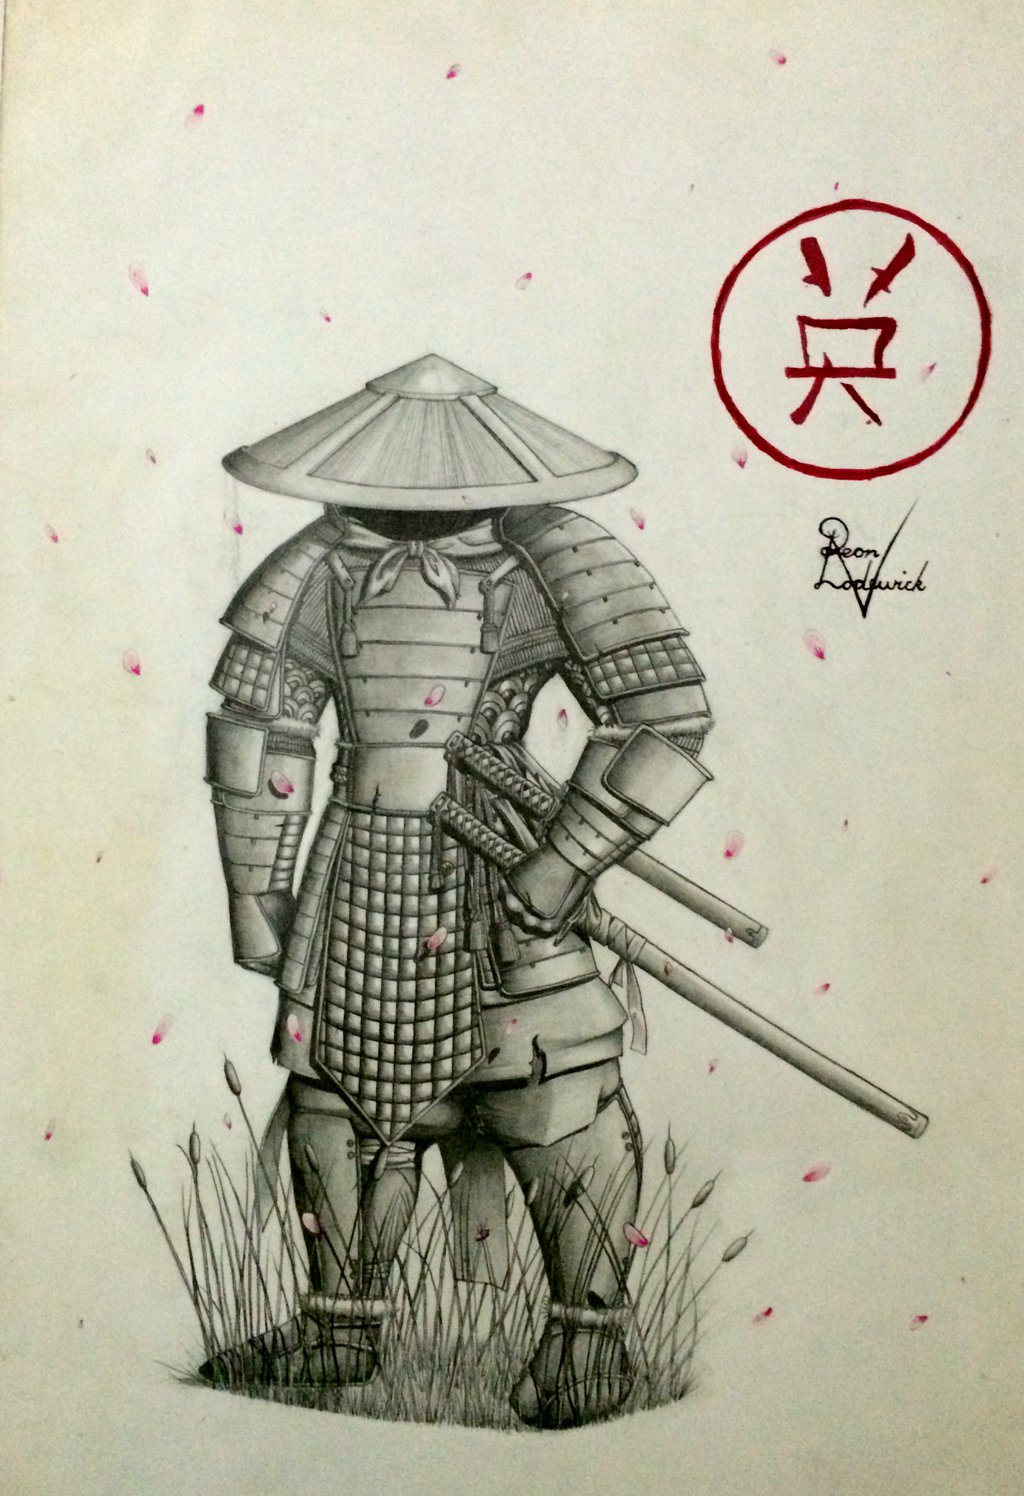 Drawn samurai samuri Pencil  Lodewick by Samurai